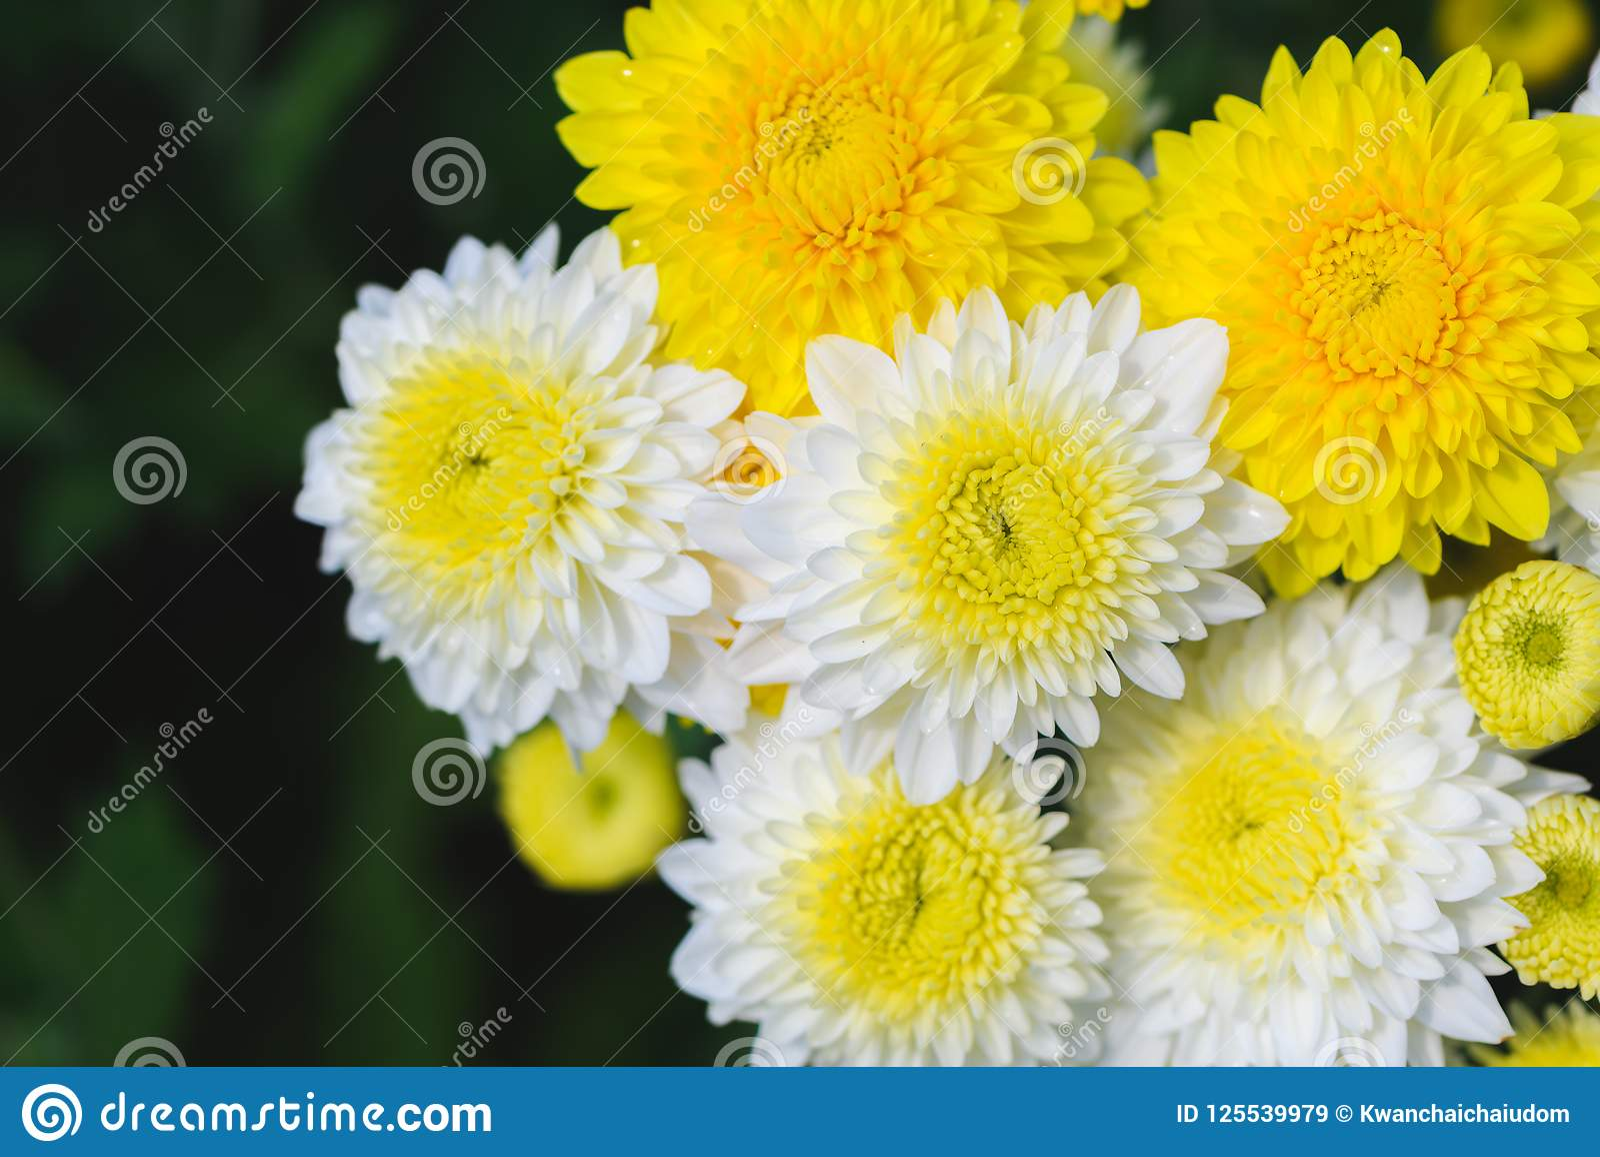 White And Yellow Chrysanthemum Flower In Garden Stock Image Image